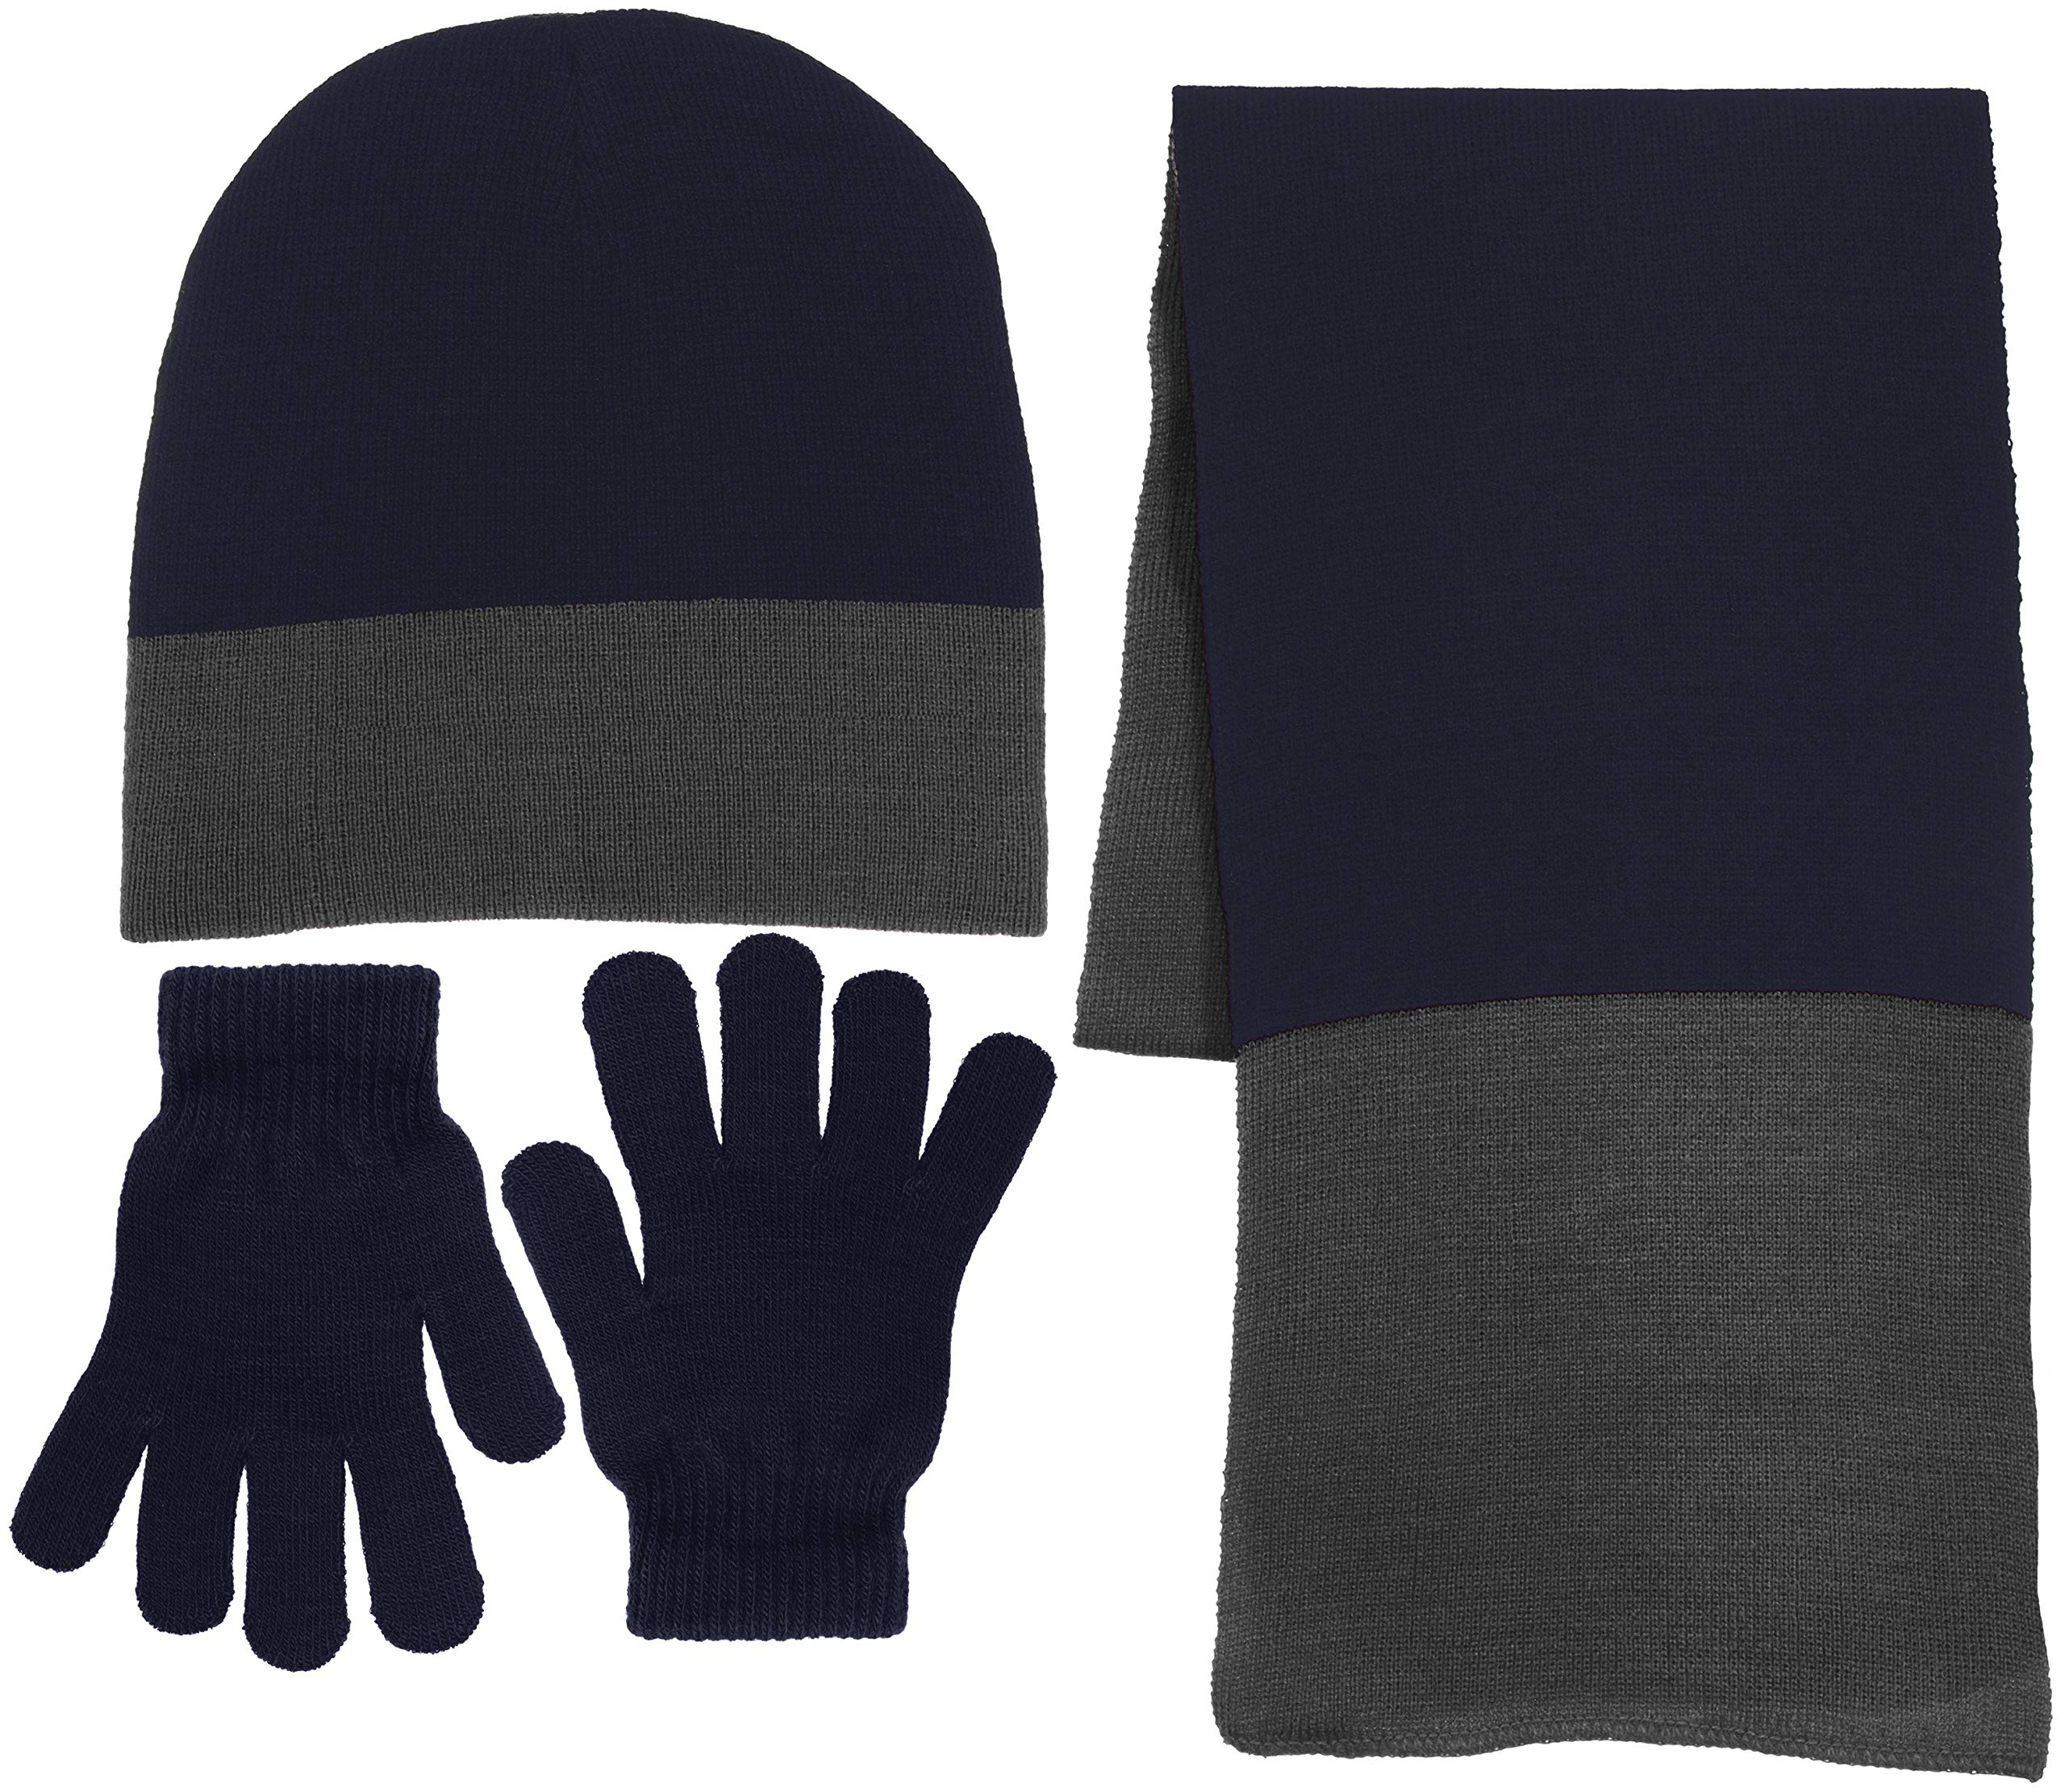 Boys 3 Piece Knit Hat, Scarf & Gloves Winter Accessories Set (Navy Blue & Gray)